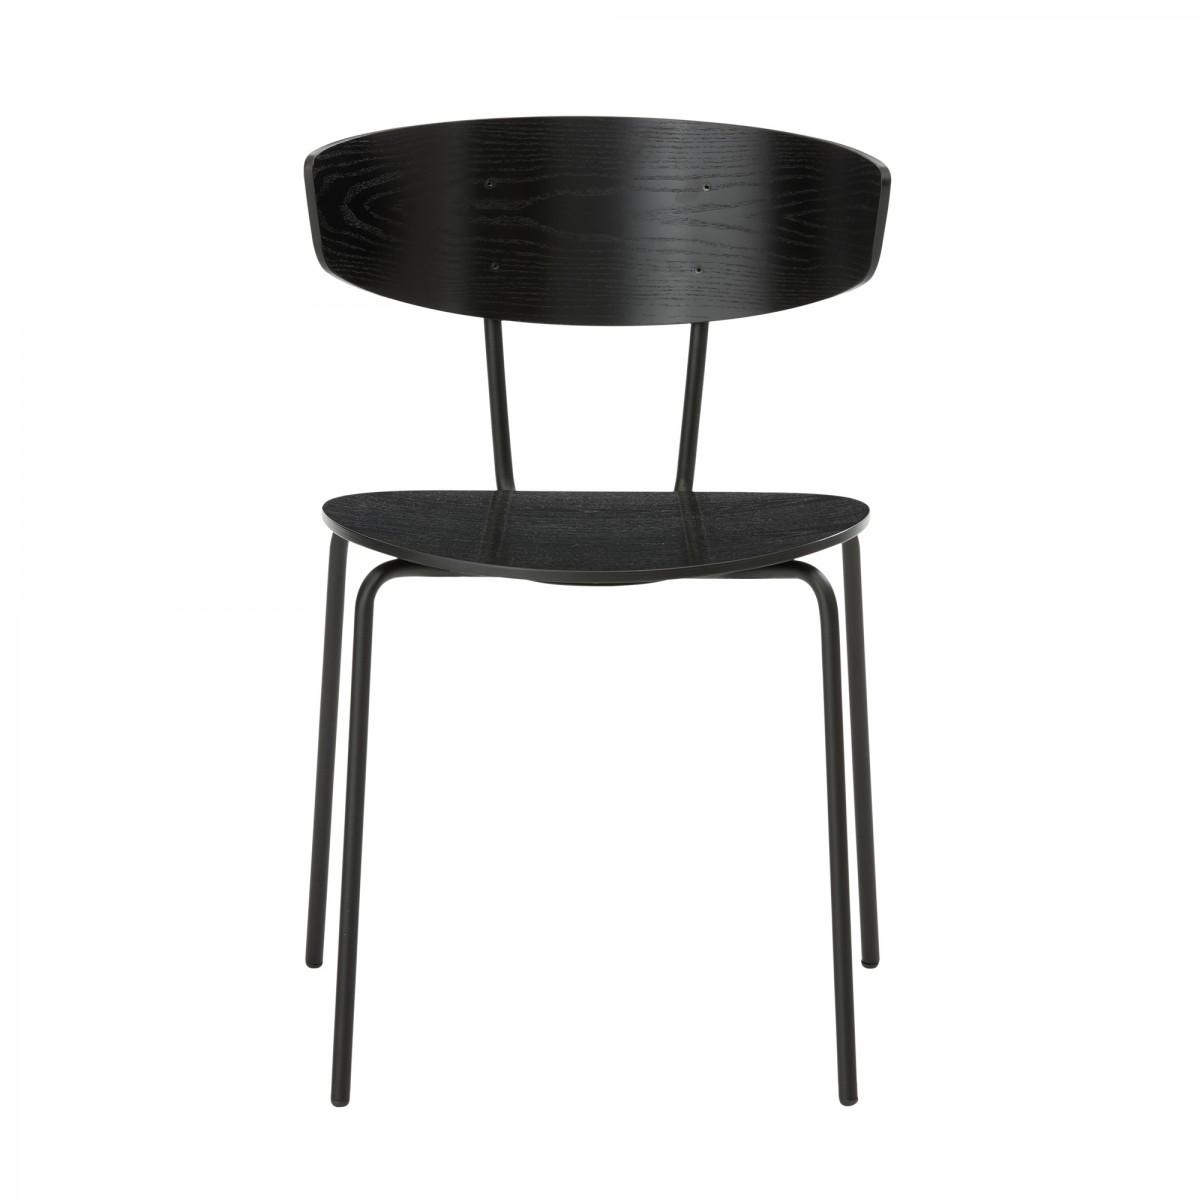 Herman black chair - Ferm Living at COLONEL shop